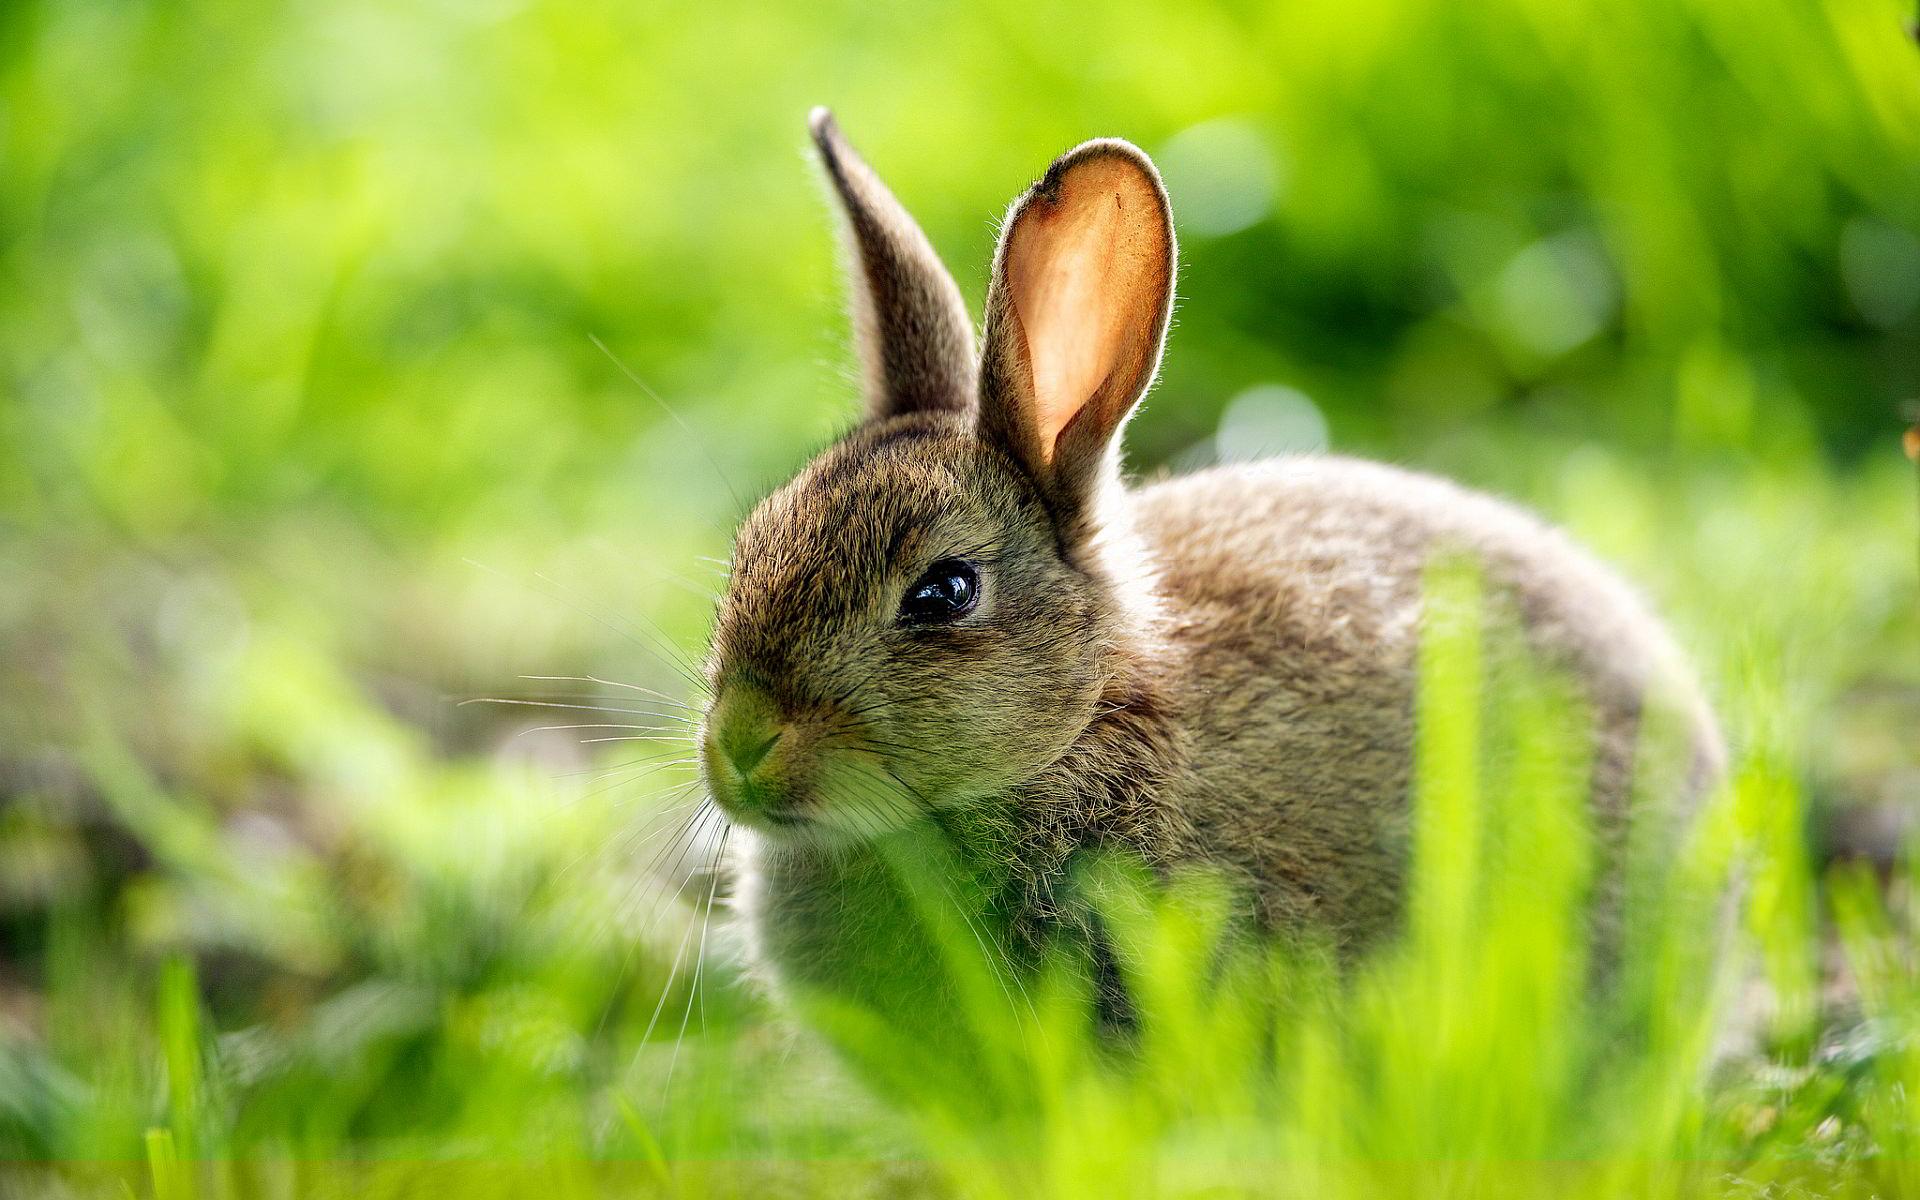 cute rabbit images